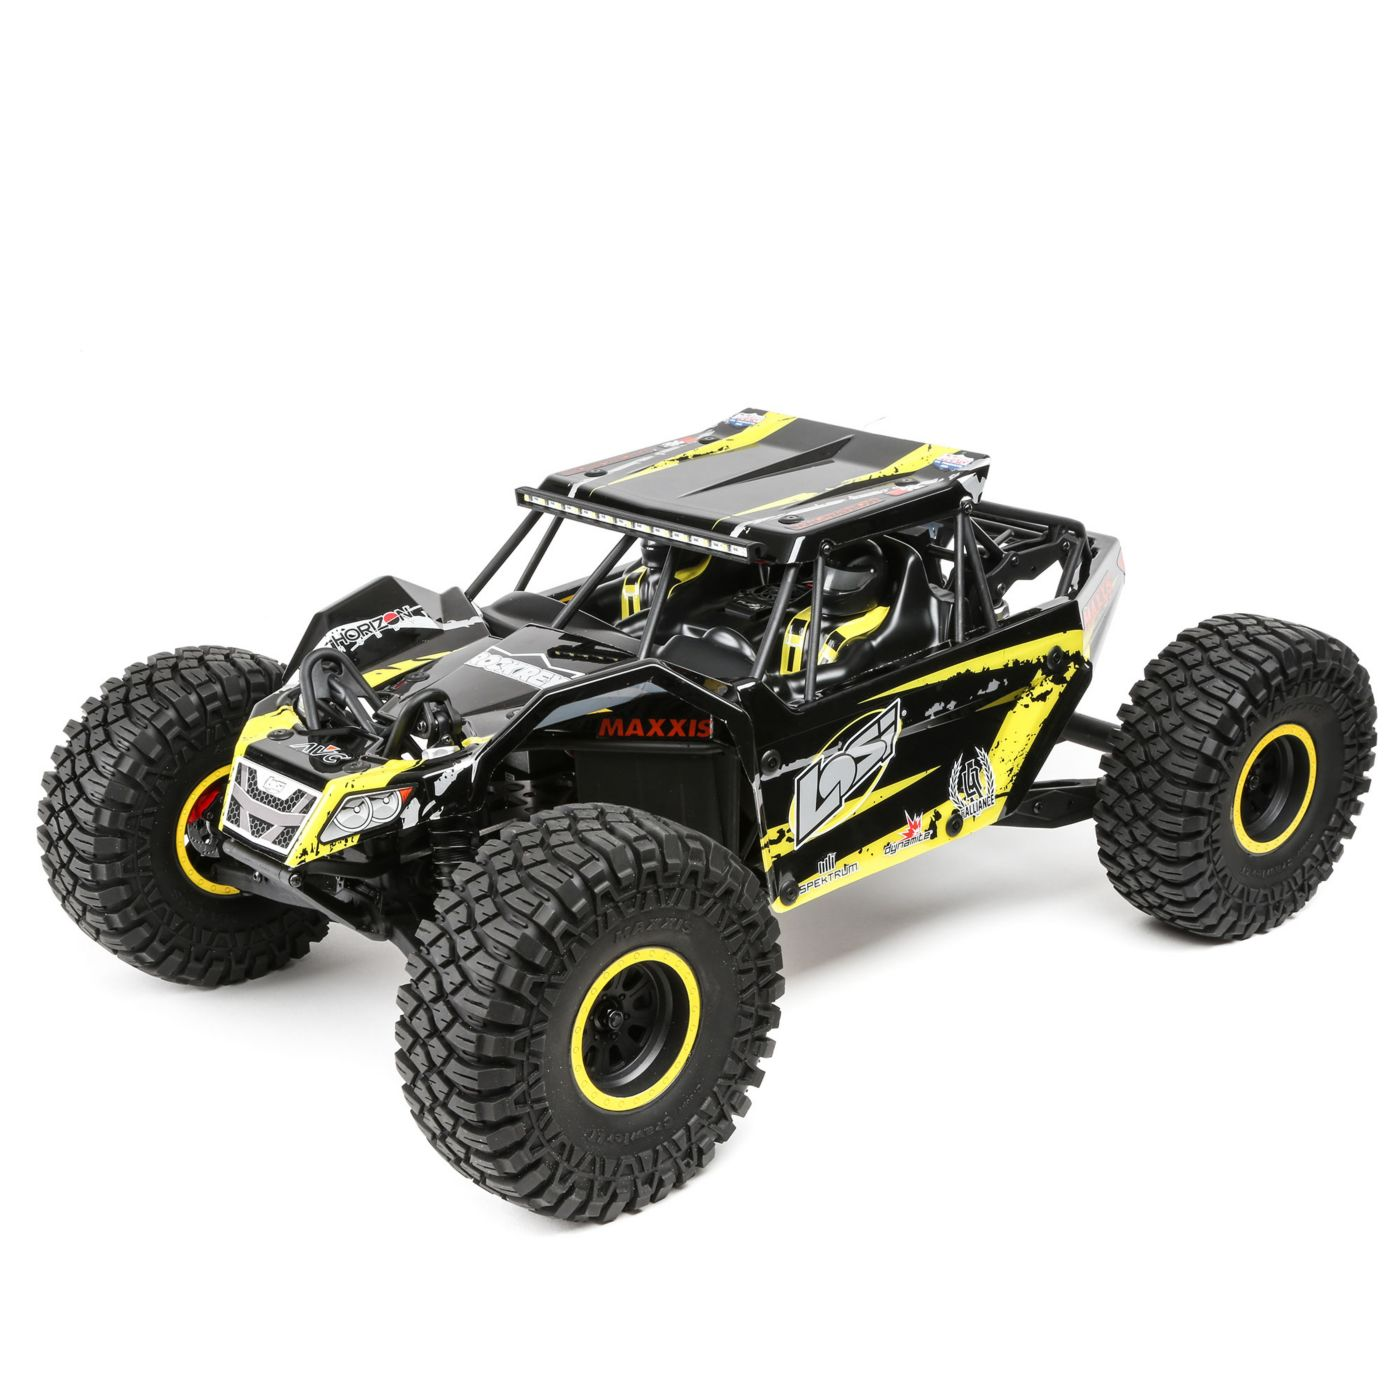 Losi Announces the 1/10 Rock Rey R/C Rock Racer